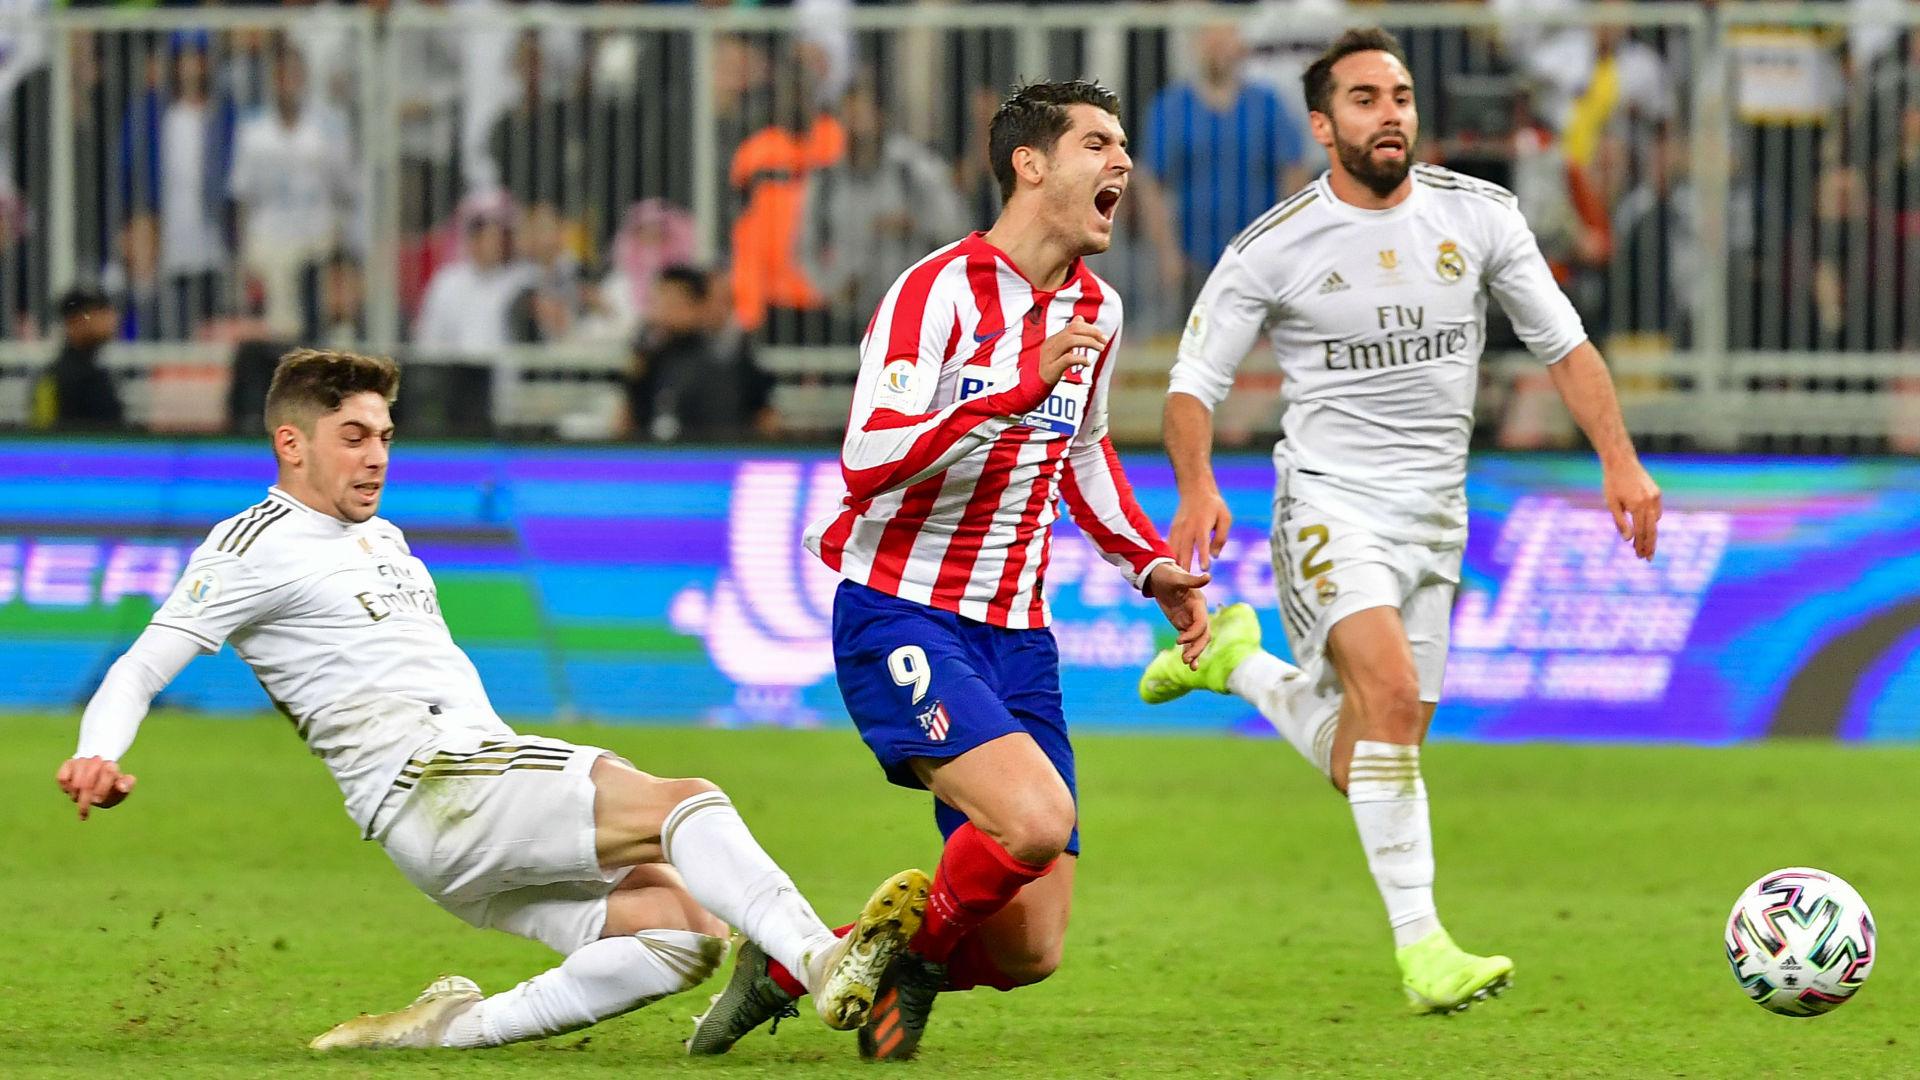 Valverde Morata tackle